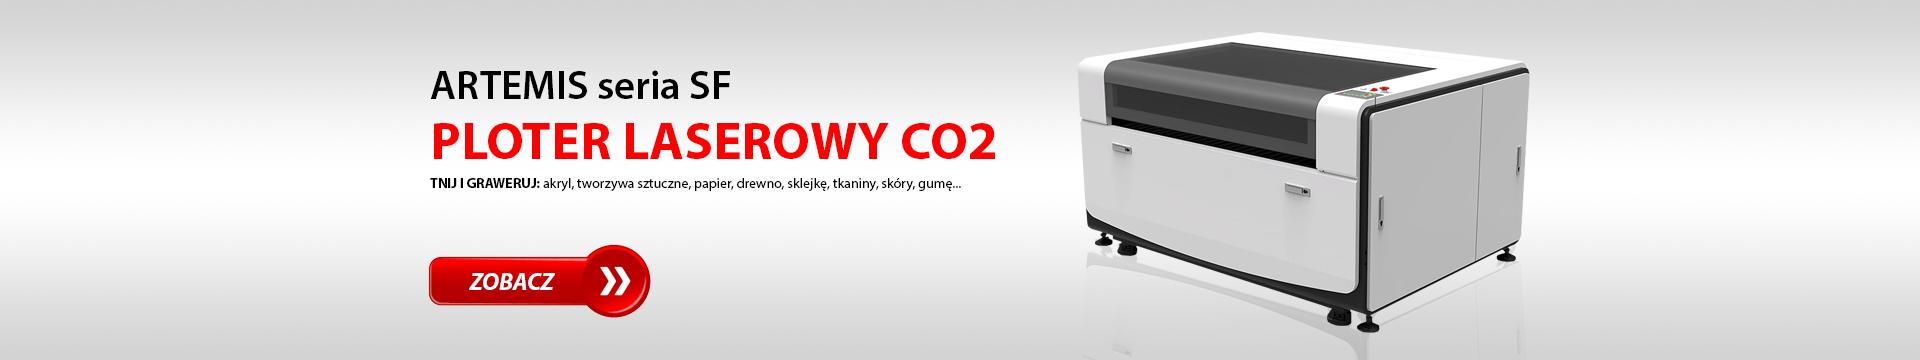 Ploter laserowy CO2 / Laser CO2